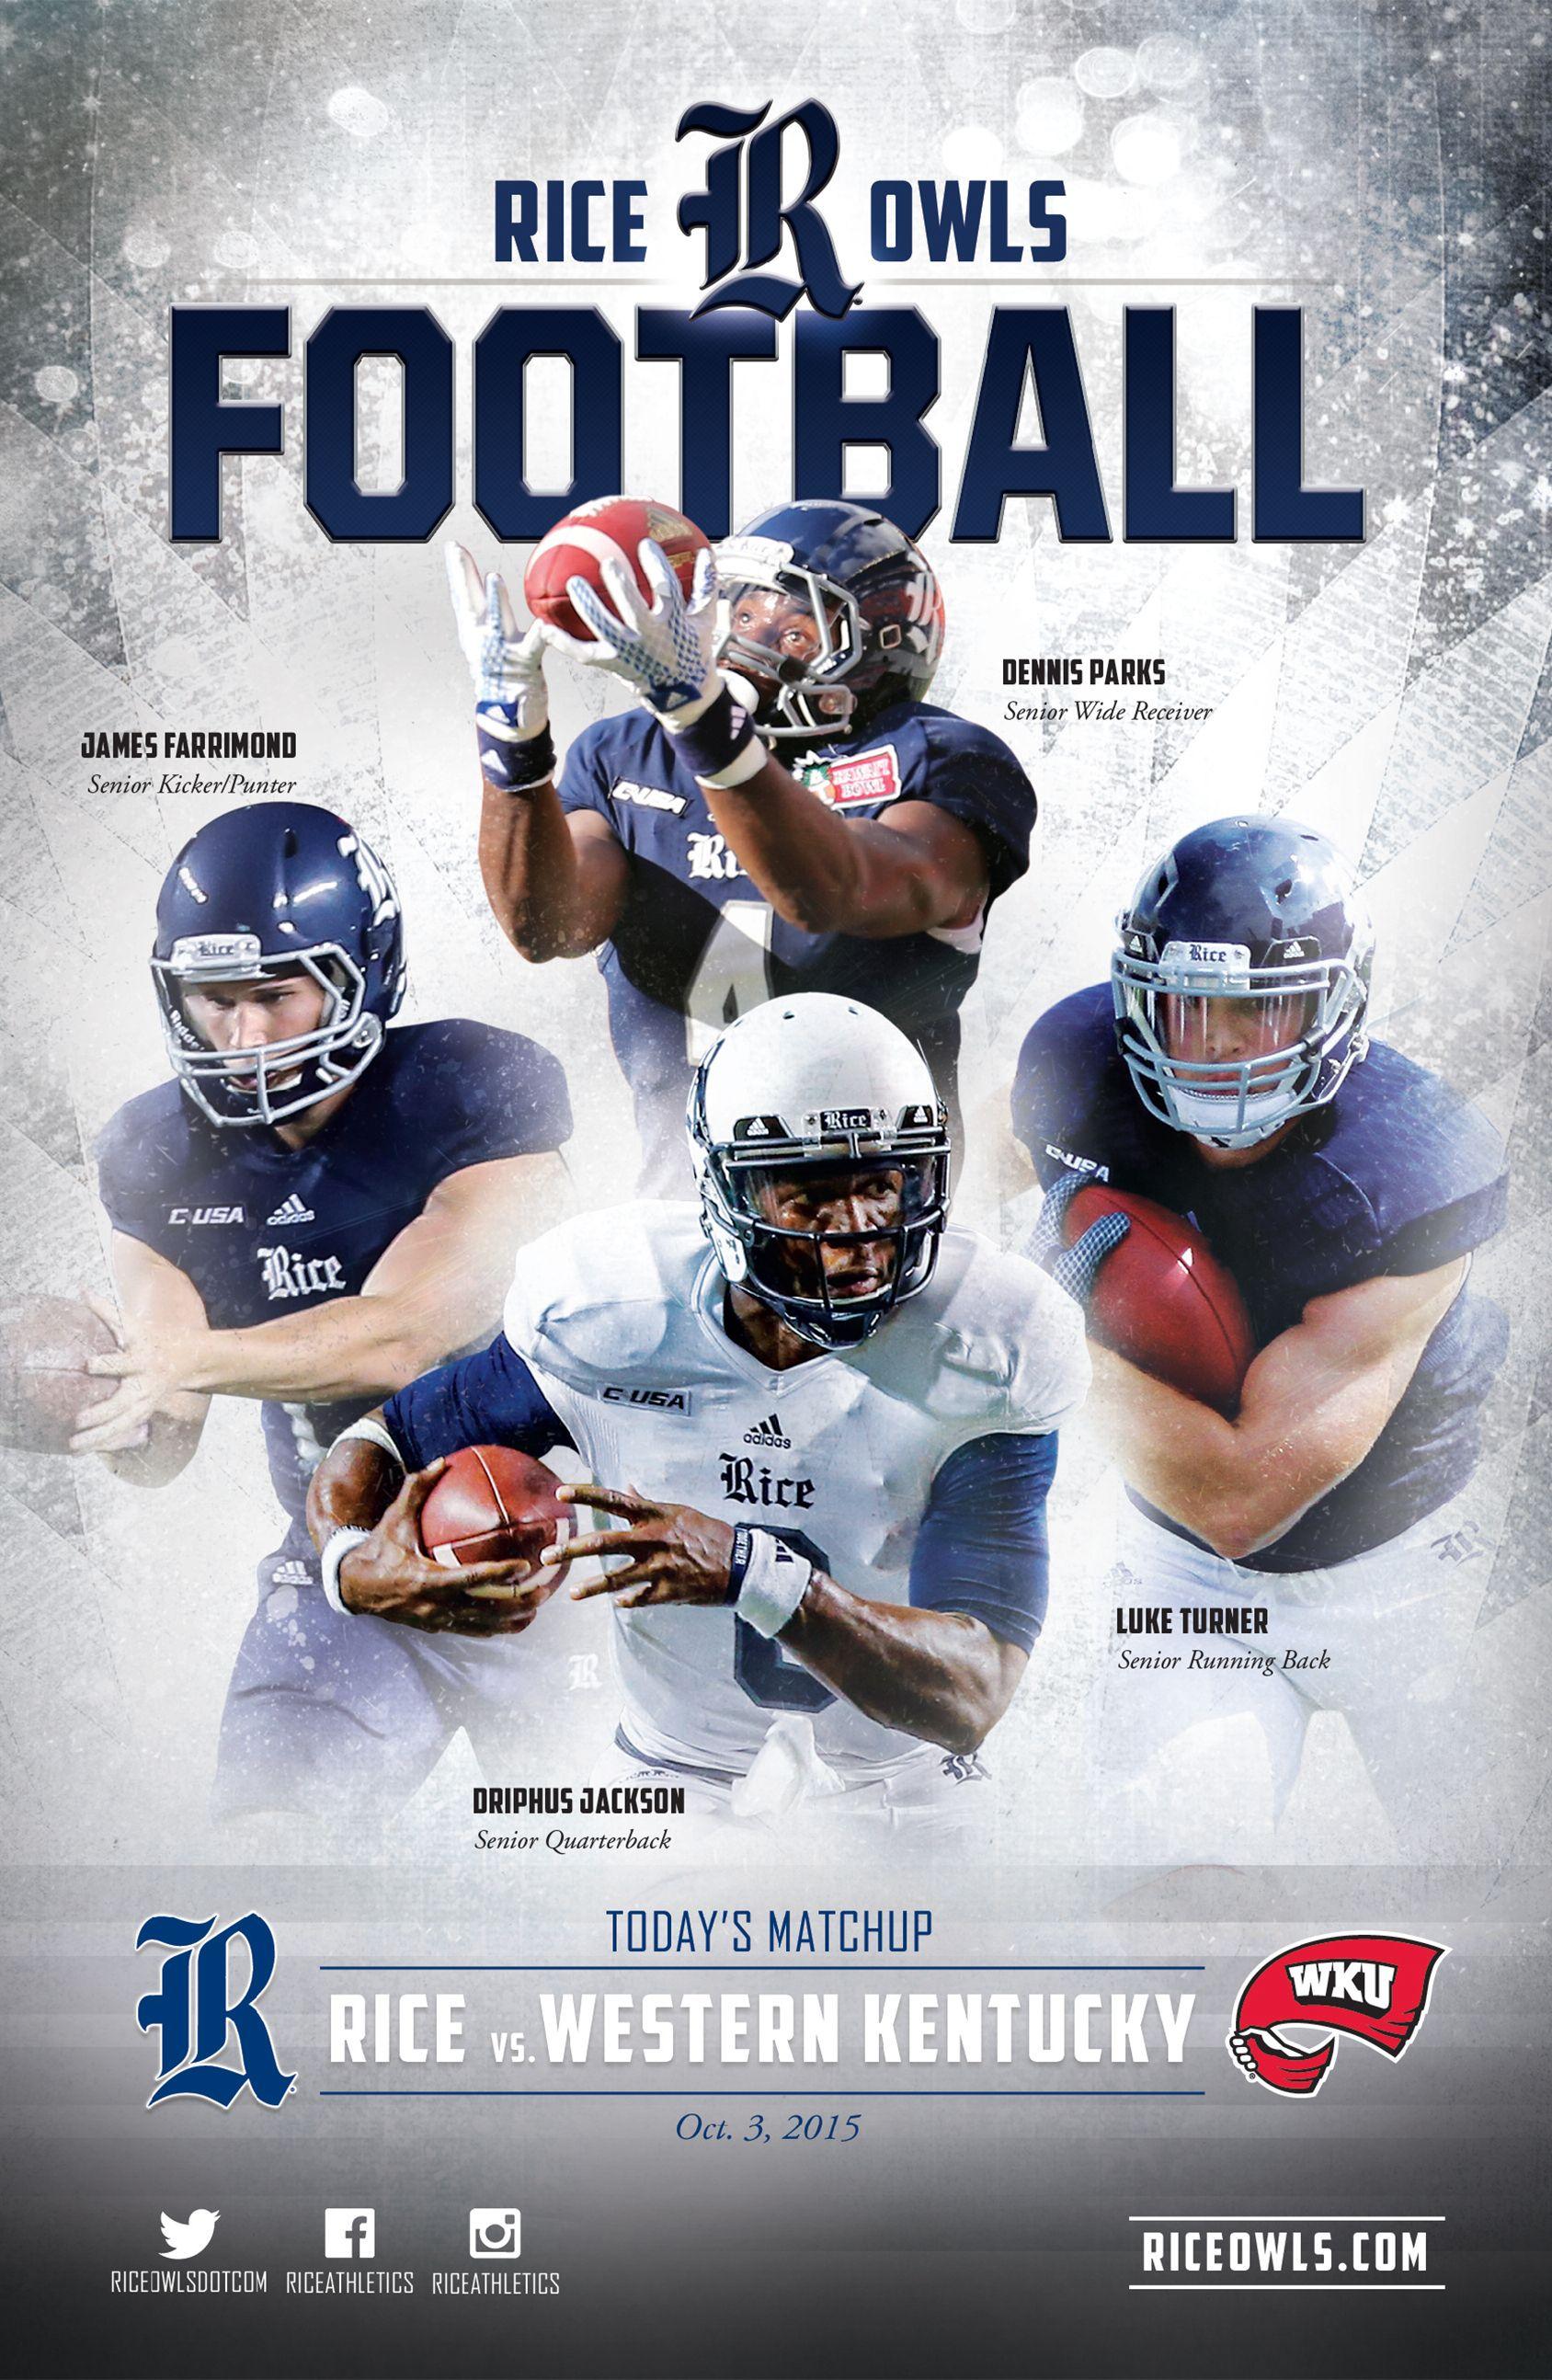 Rice Owls Athletics Football Program Vs Wku Athletics On October 3 2015 Cover Features James Farrimond Football Program West Coast Conference Sports Images